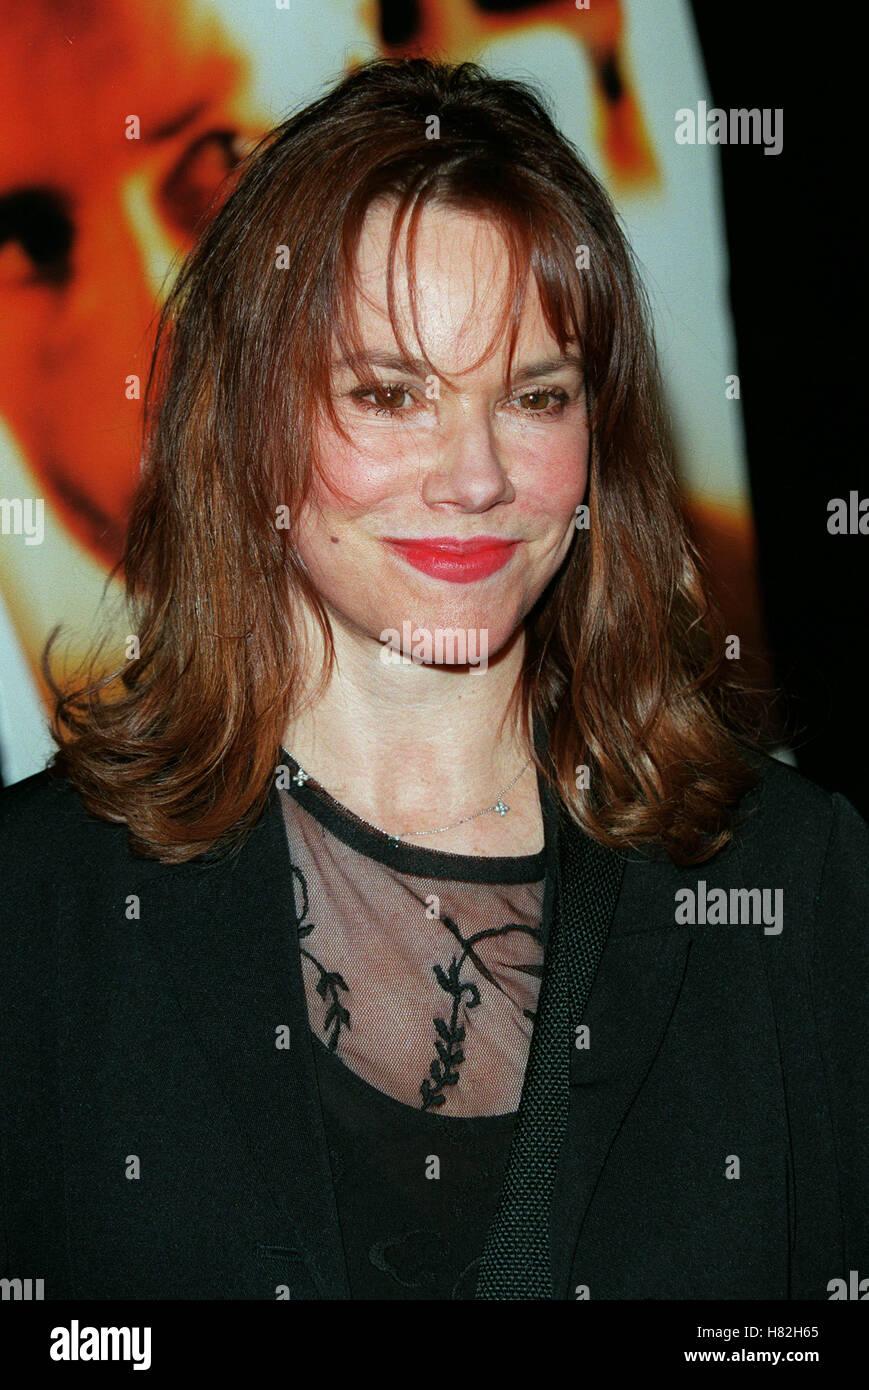 BARBARA HERSHEY 'MEMENTO' LA PREMIER WESTWOOD LA USA 13 March 2001 - Stock Image